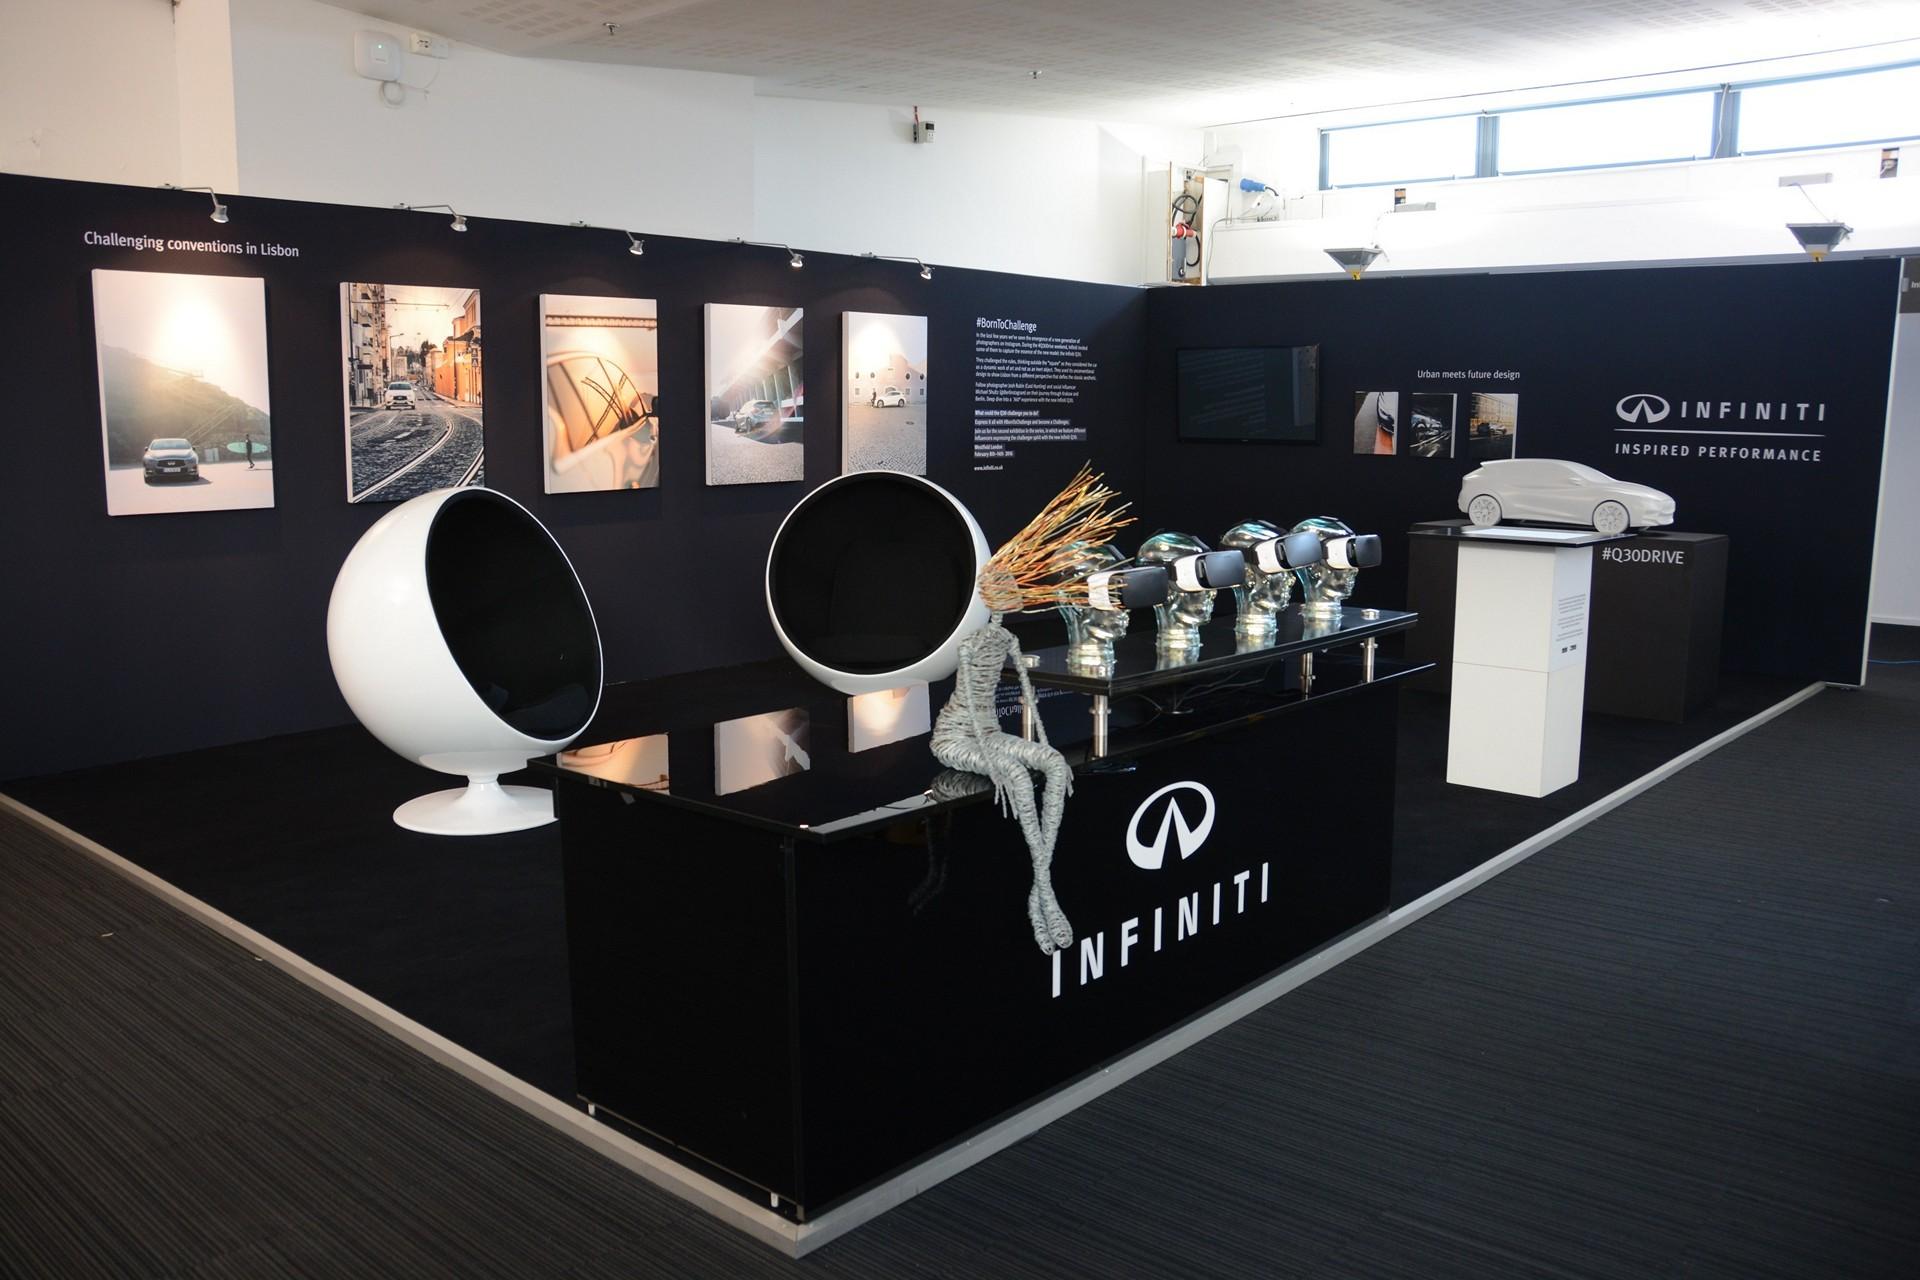 Infiniti QX30 car-art displayed at London Art Fair © Nissan Motor Co., Ltd.